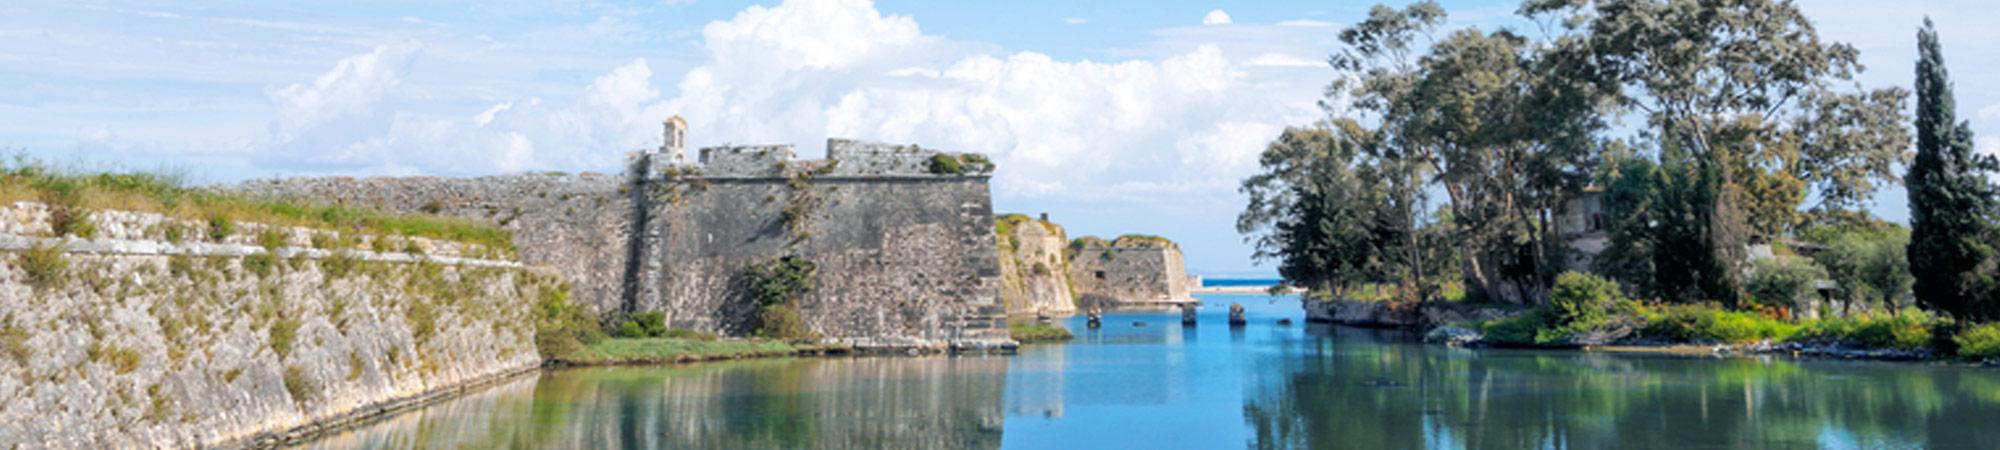 history ionian horizon villas lefkada greece